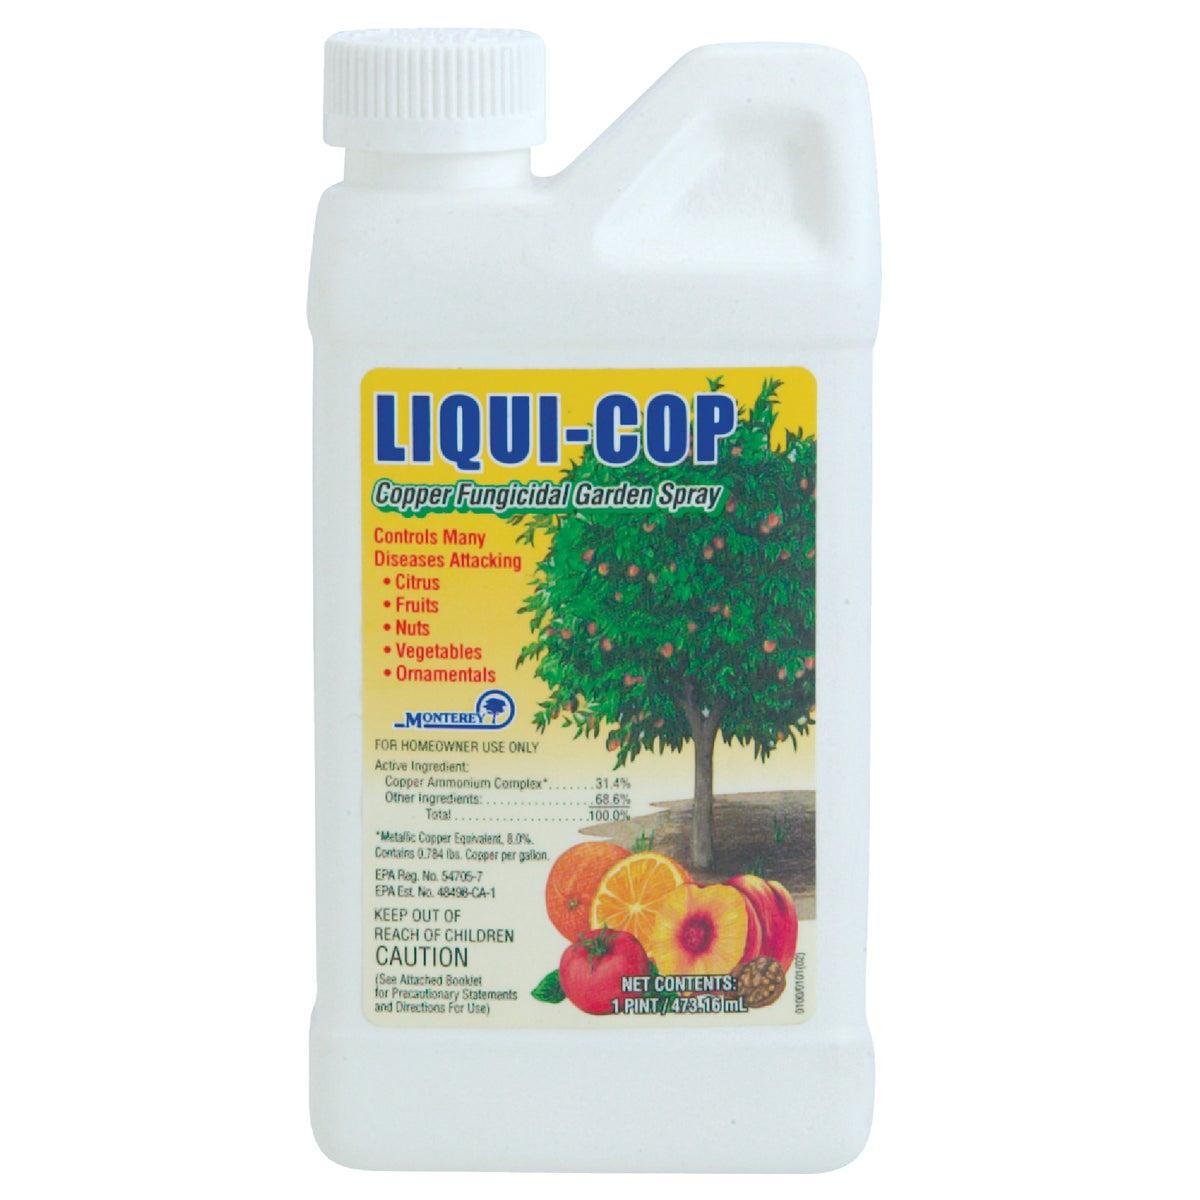 PT LIQUI-COP FUNGICIDE - LG3100 by Monterey Lawn&garden